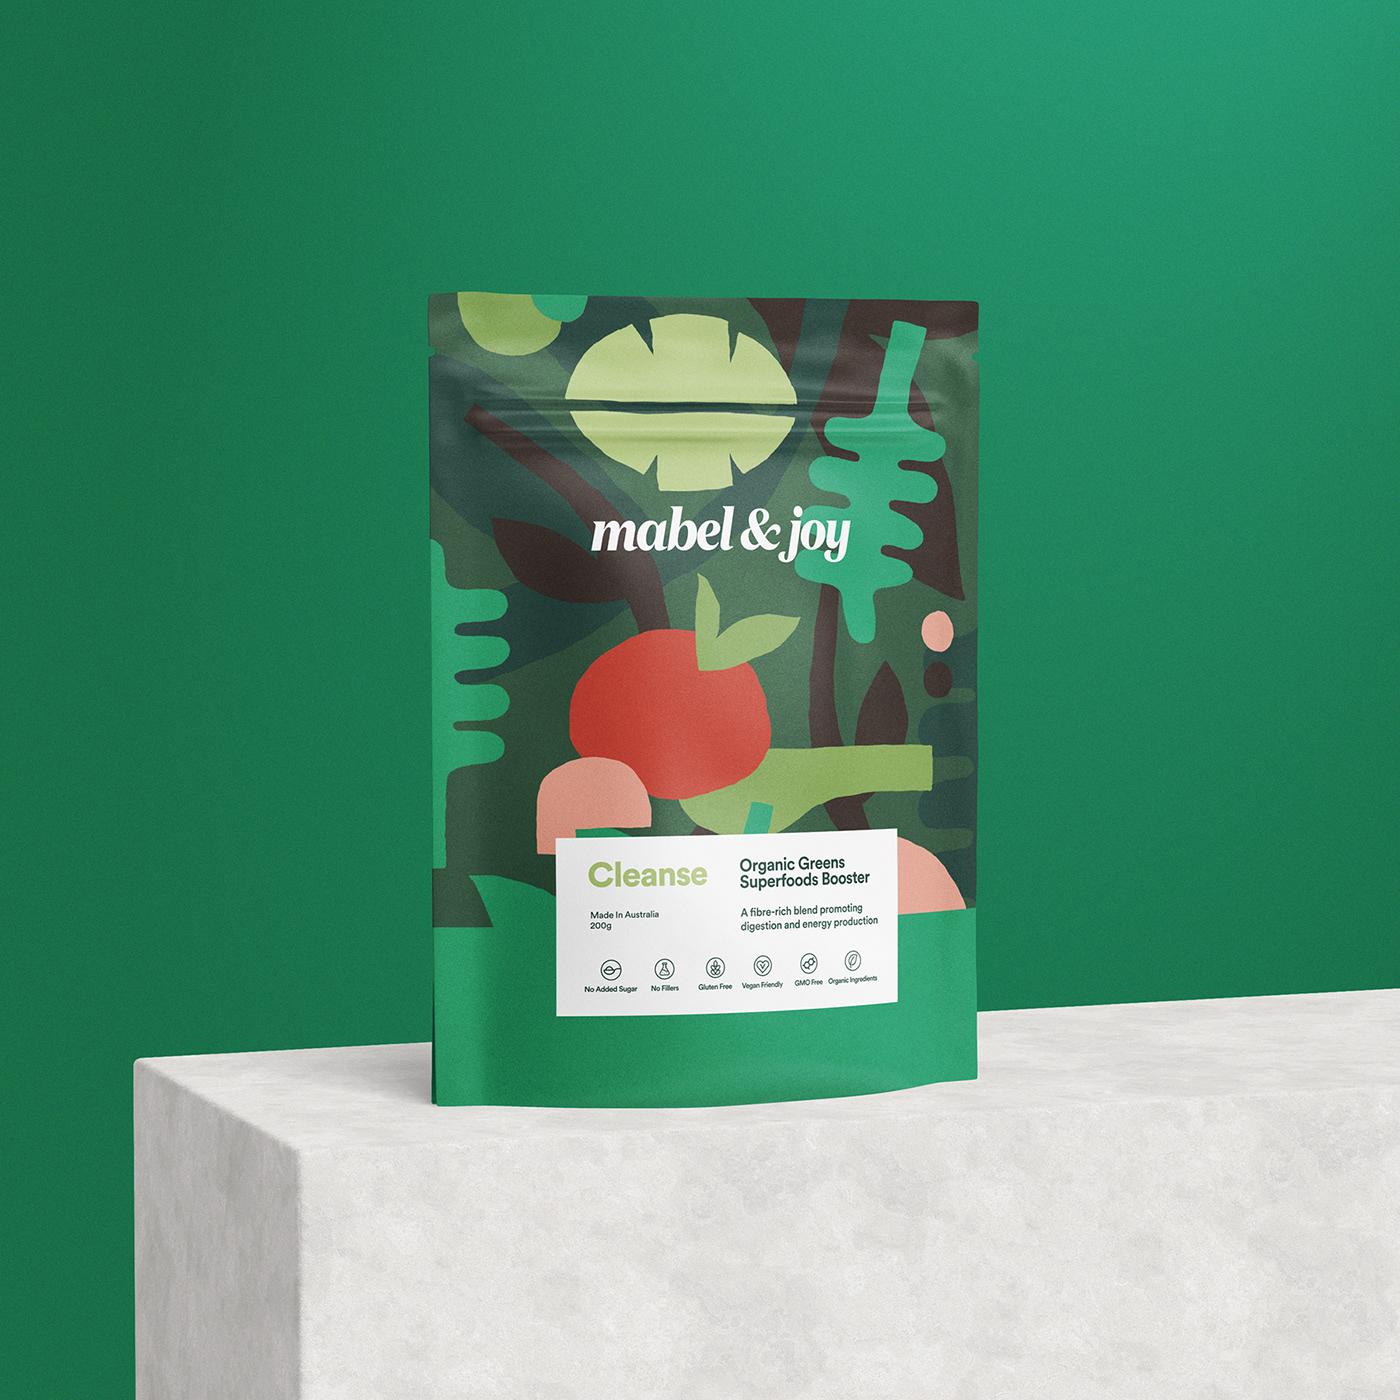 Jo Cutri Studio. Branding. Packaging Design. Graphic Design. Organic Superfoods. Food Packaging